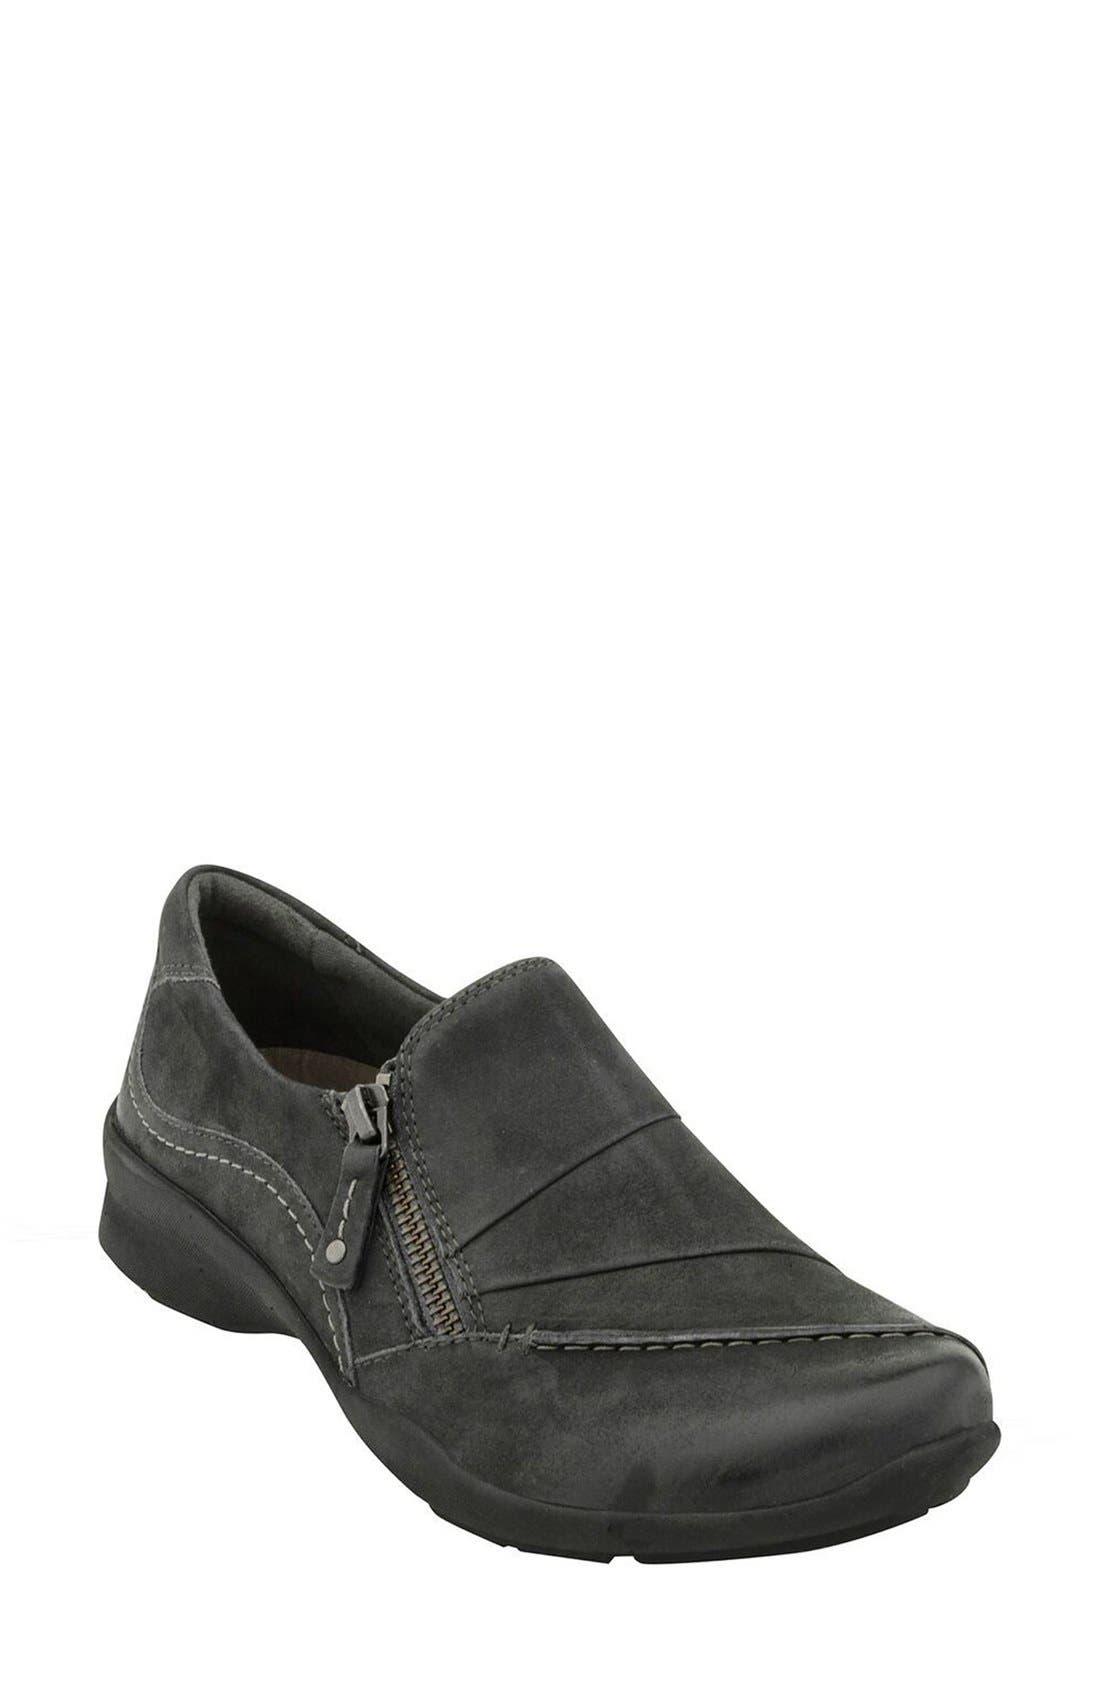 'Anise' Slip-On Sneaker,                         Main,                         color, Dark Grey Nubuck Leather